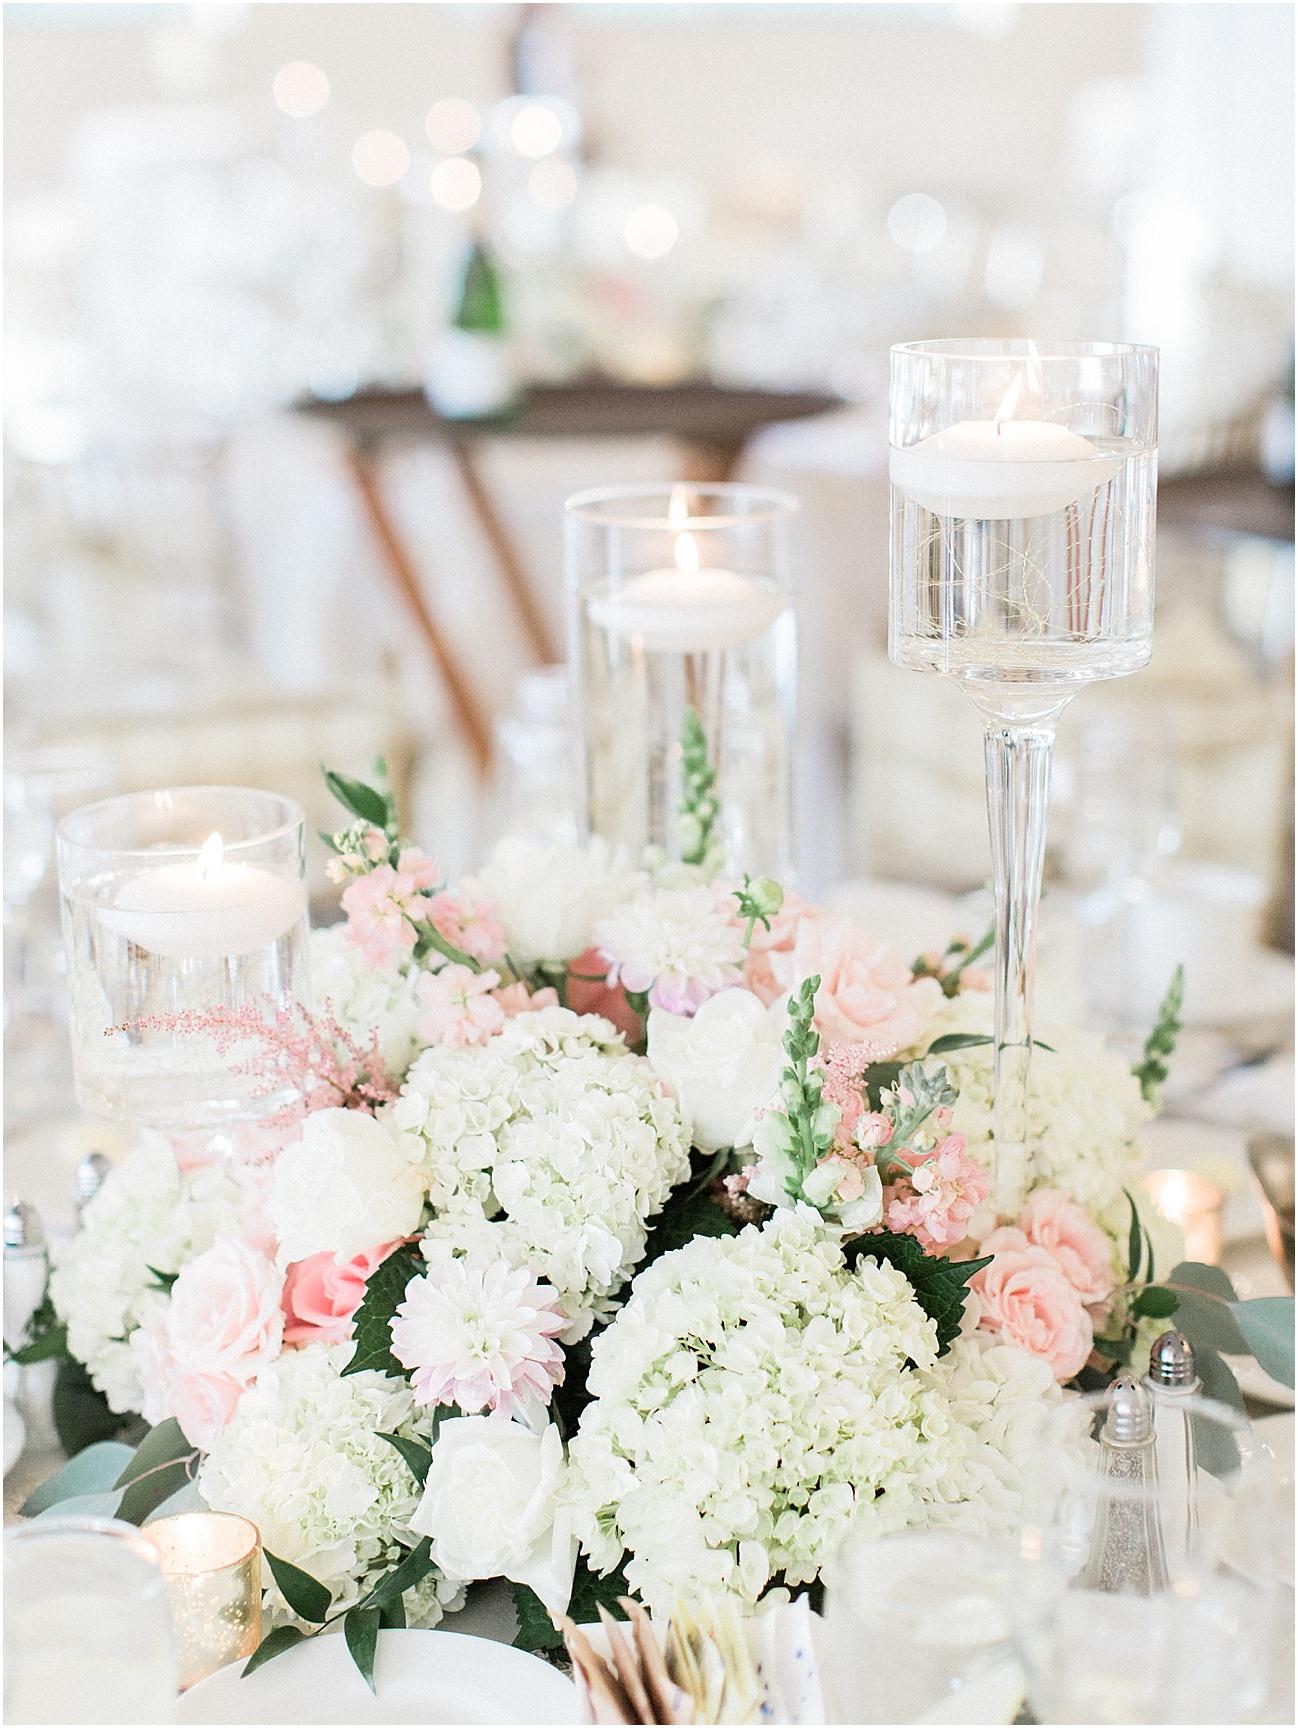 bianca_chris_danversport_italian_blush_gold_north_shore_cape_cod_boston_wedding_photographer_meredith_jane_photography_photo_1150.jpg